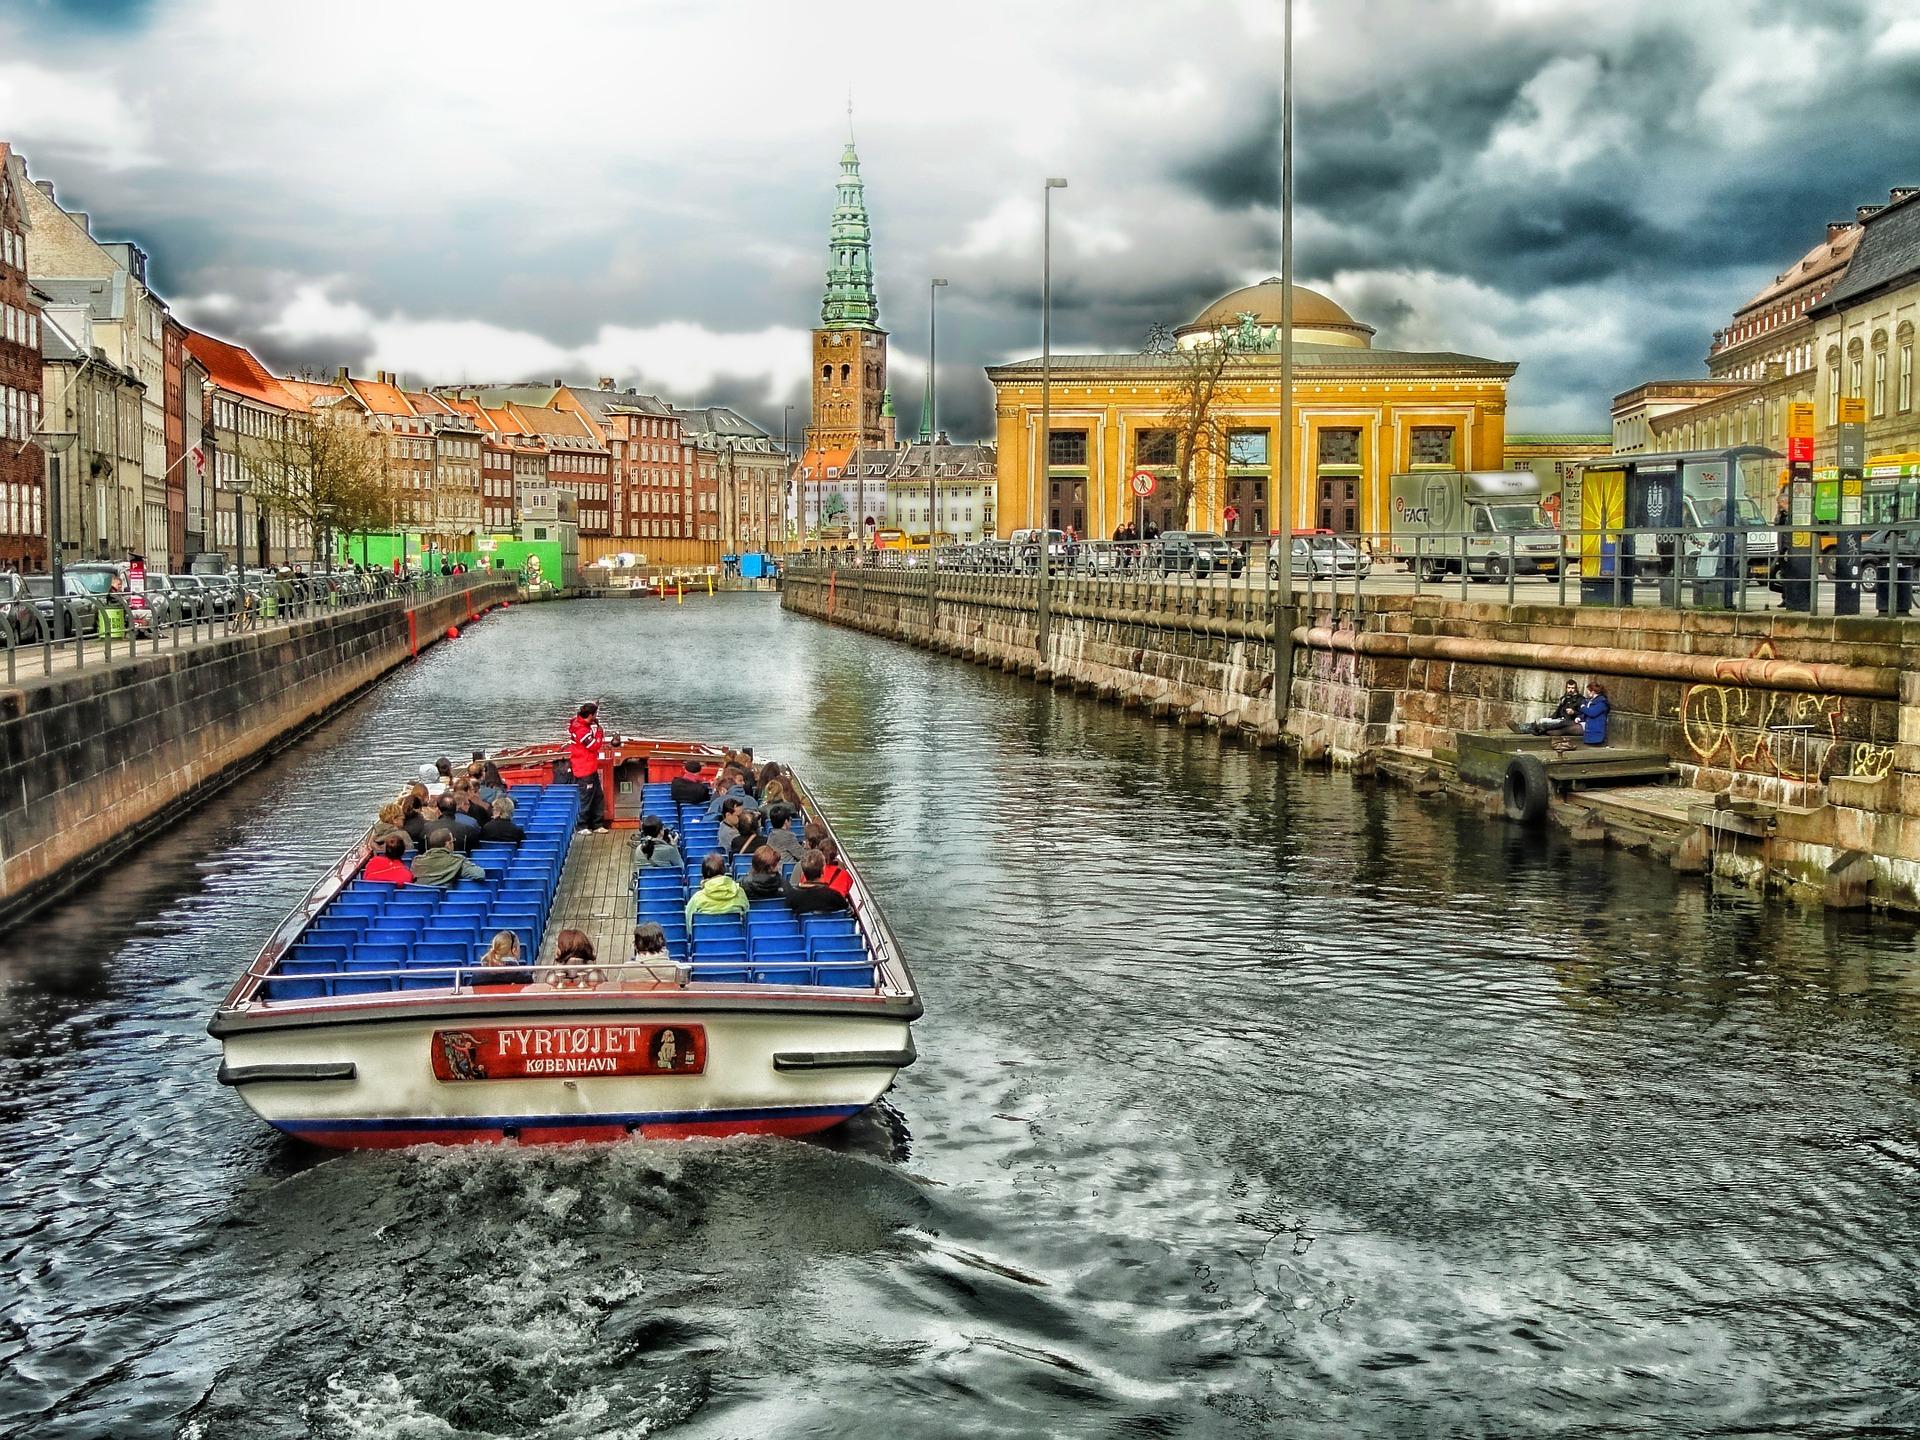 Private detectives and investigators in Denmark